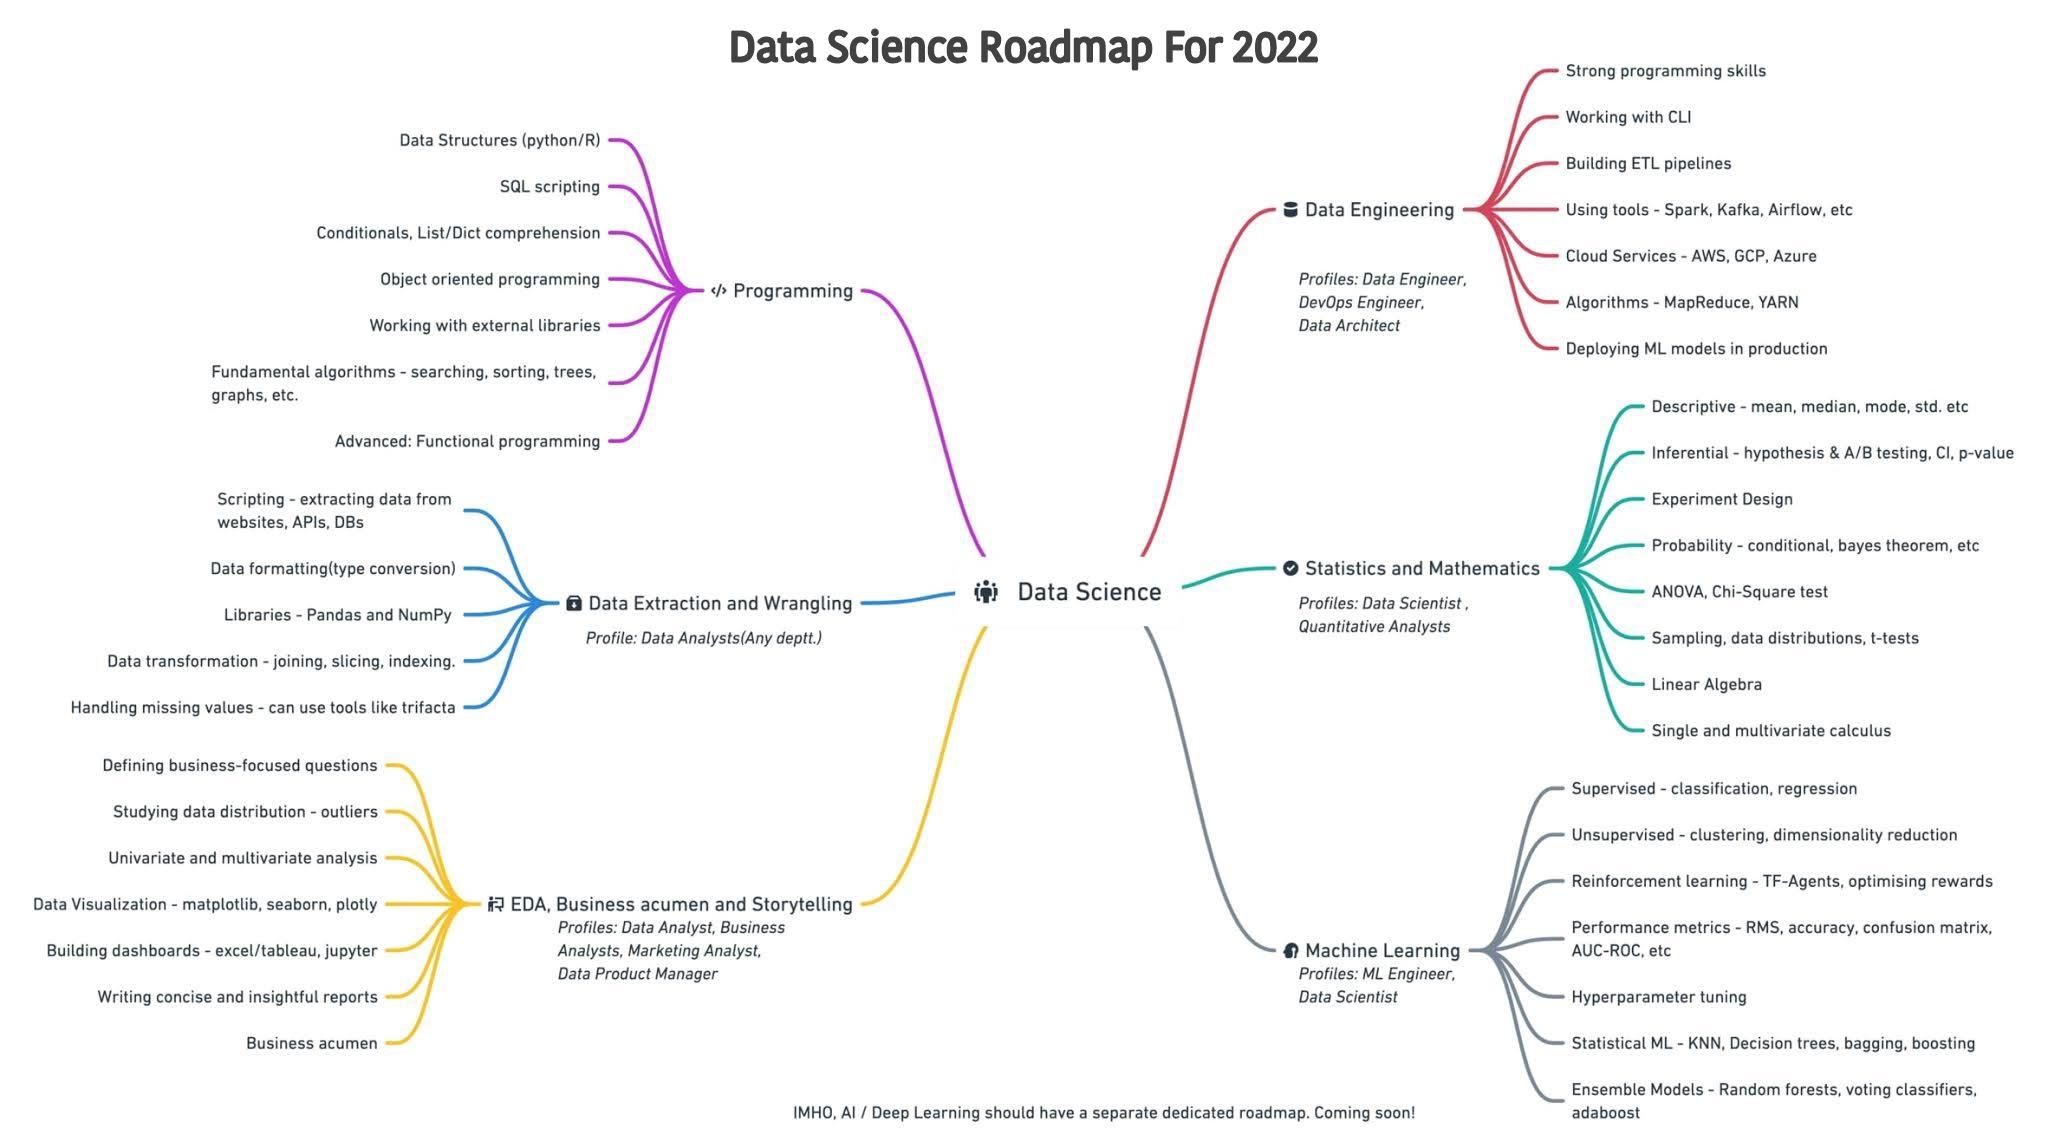 2022 Data Science Roadmap